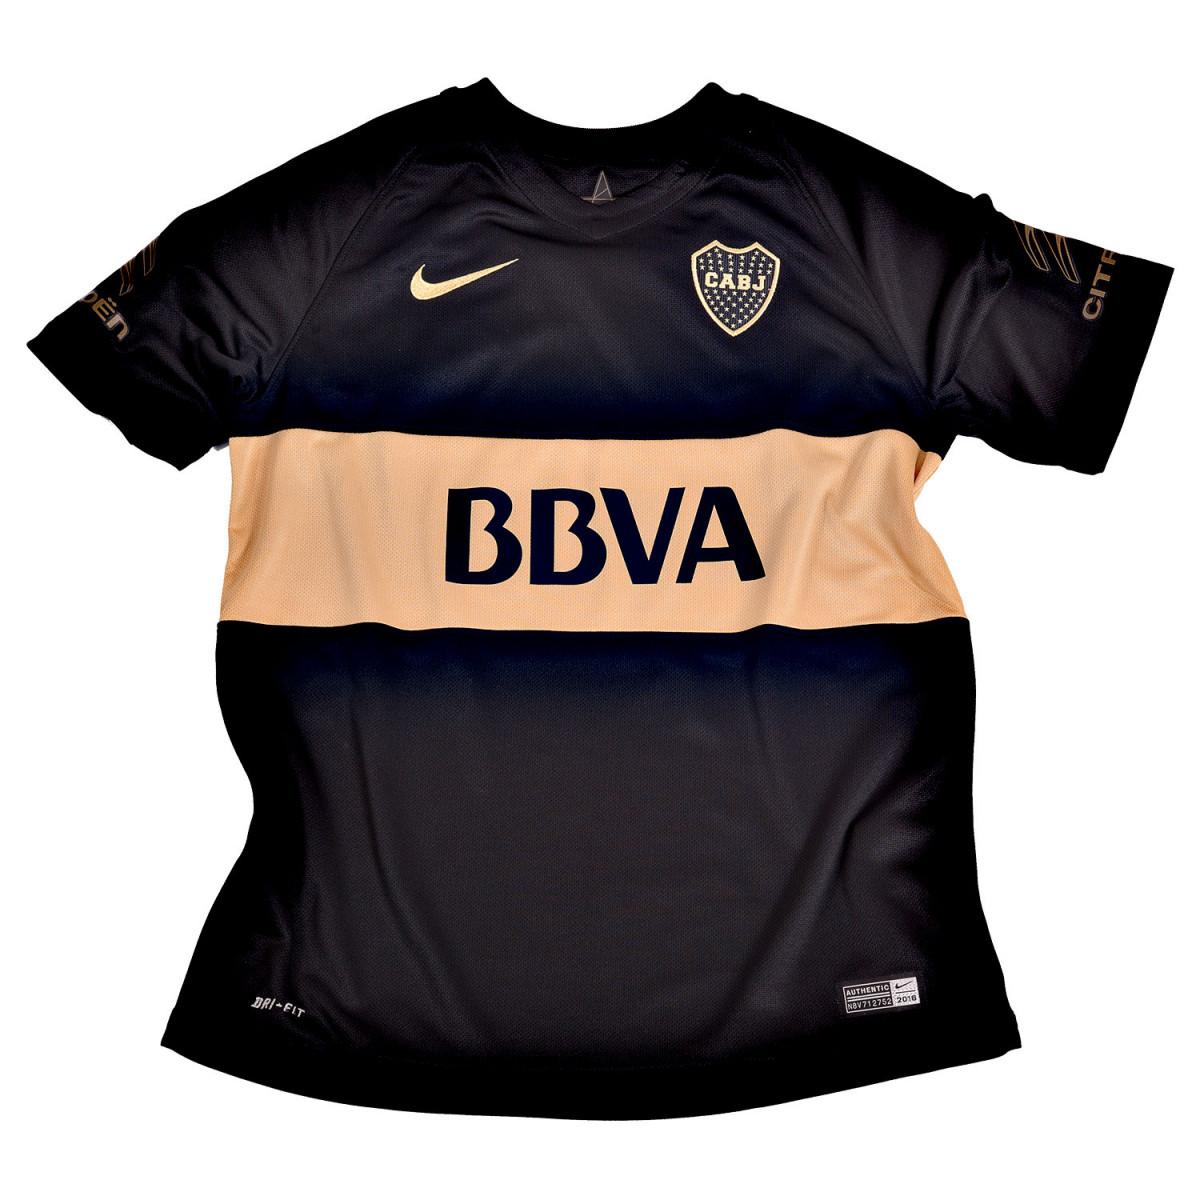 Camiseta Nike Boca Stadium Jsy Boys 2016